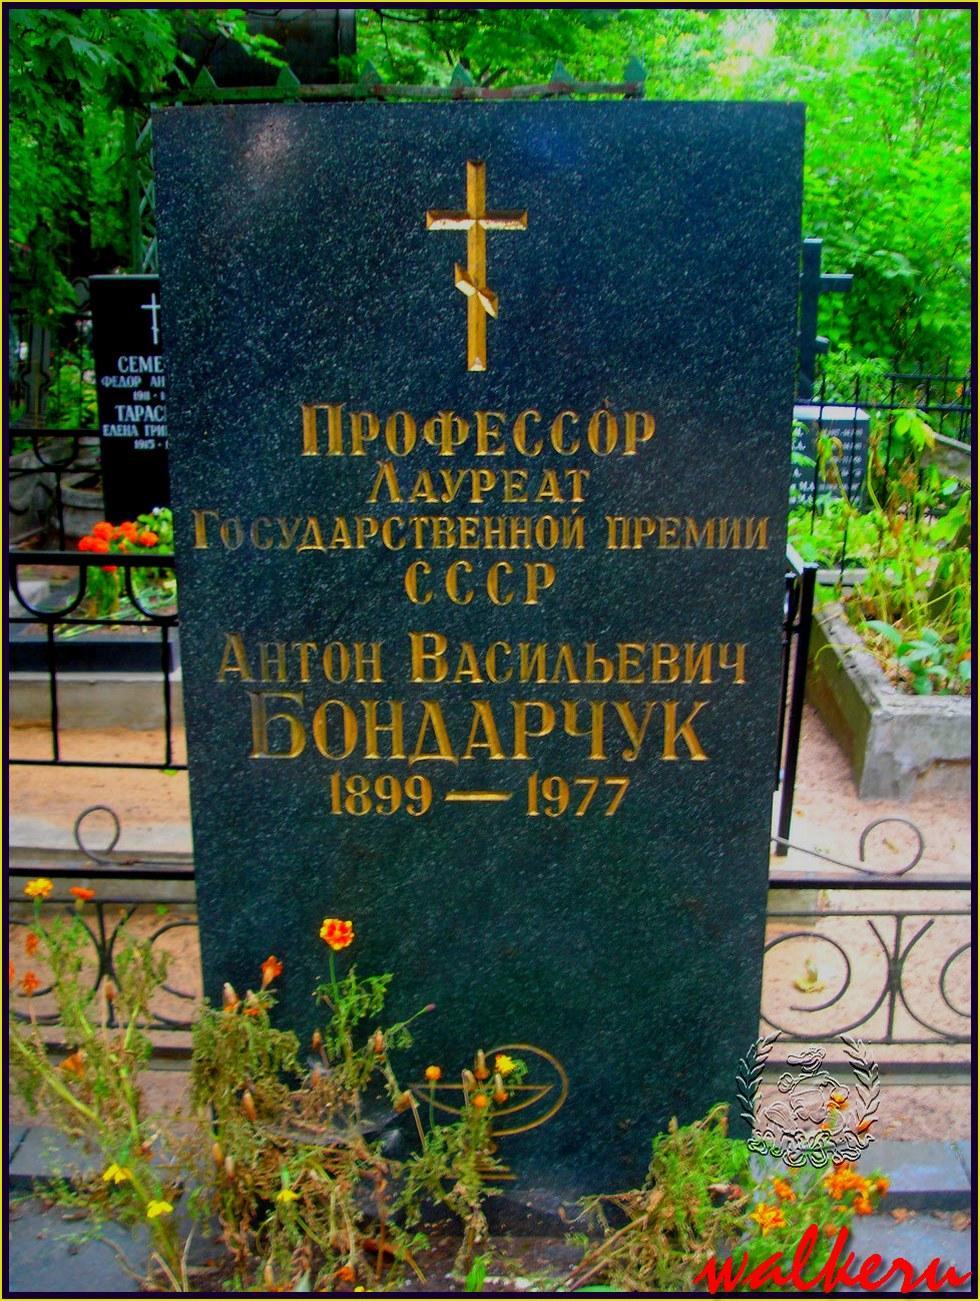 Могила Бондарчук А.В. на Большеохтинском кладбище